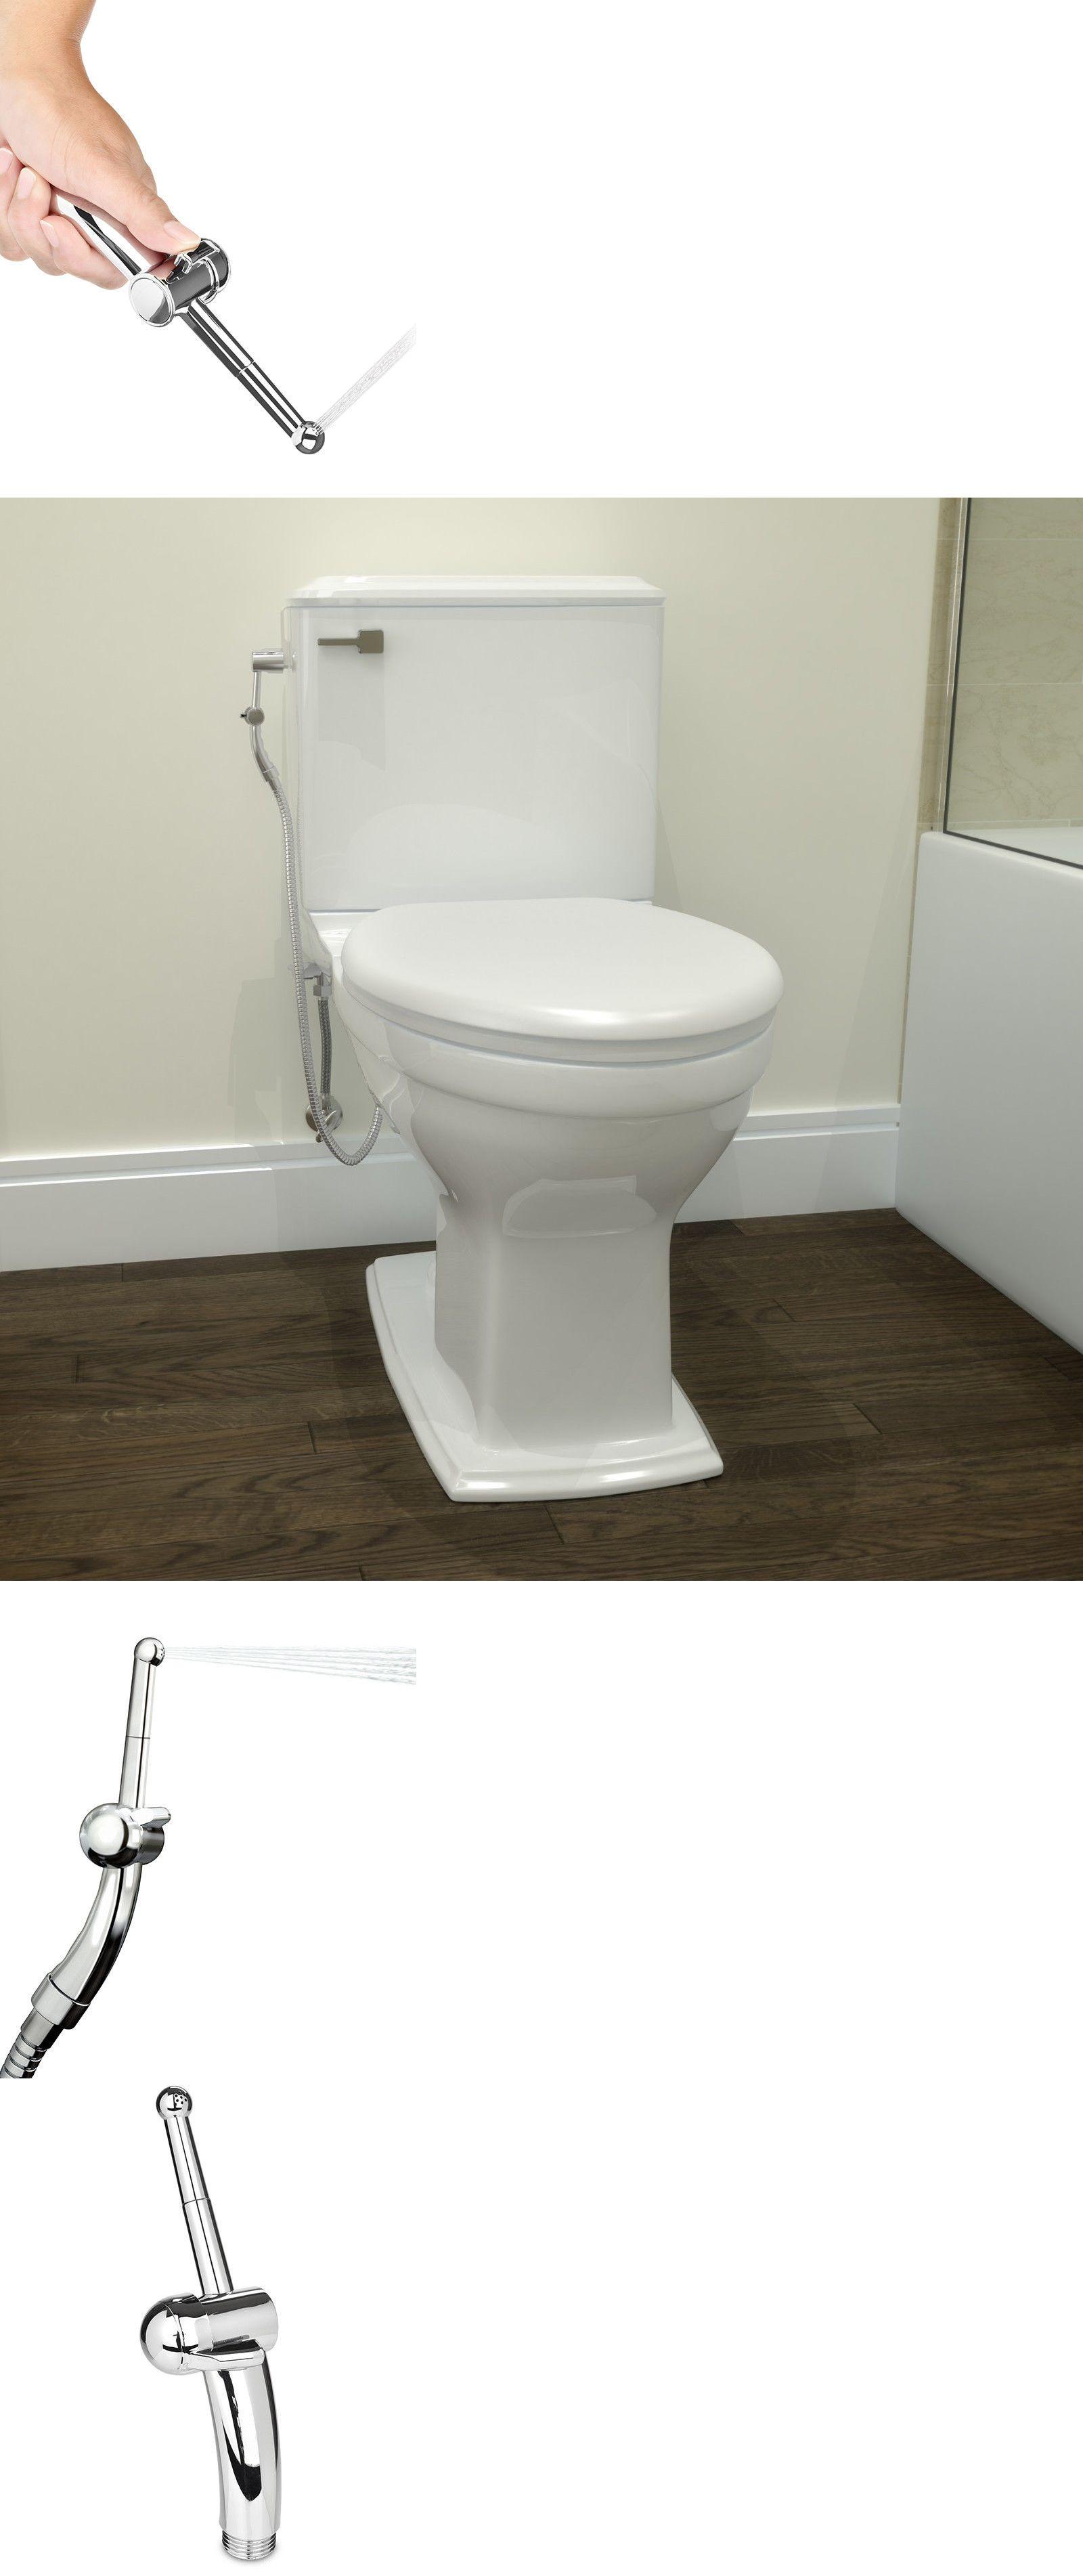 Bidets And Toilet Attachments 101405 Cleanspa Advanced Bidet